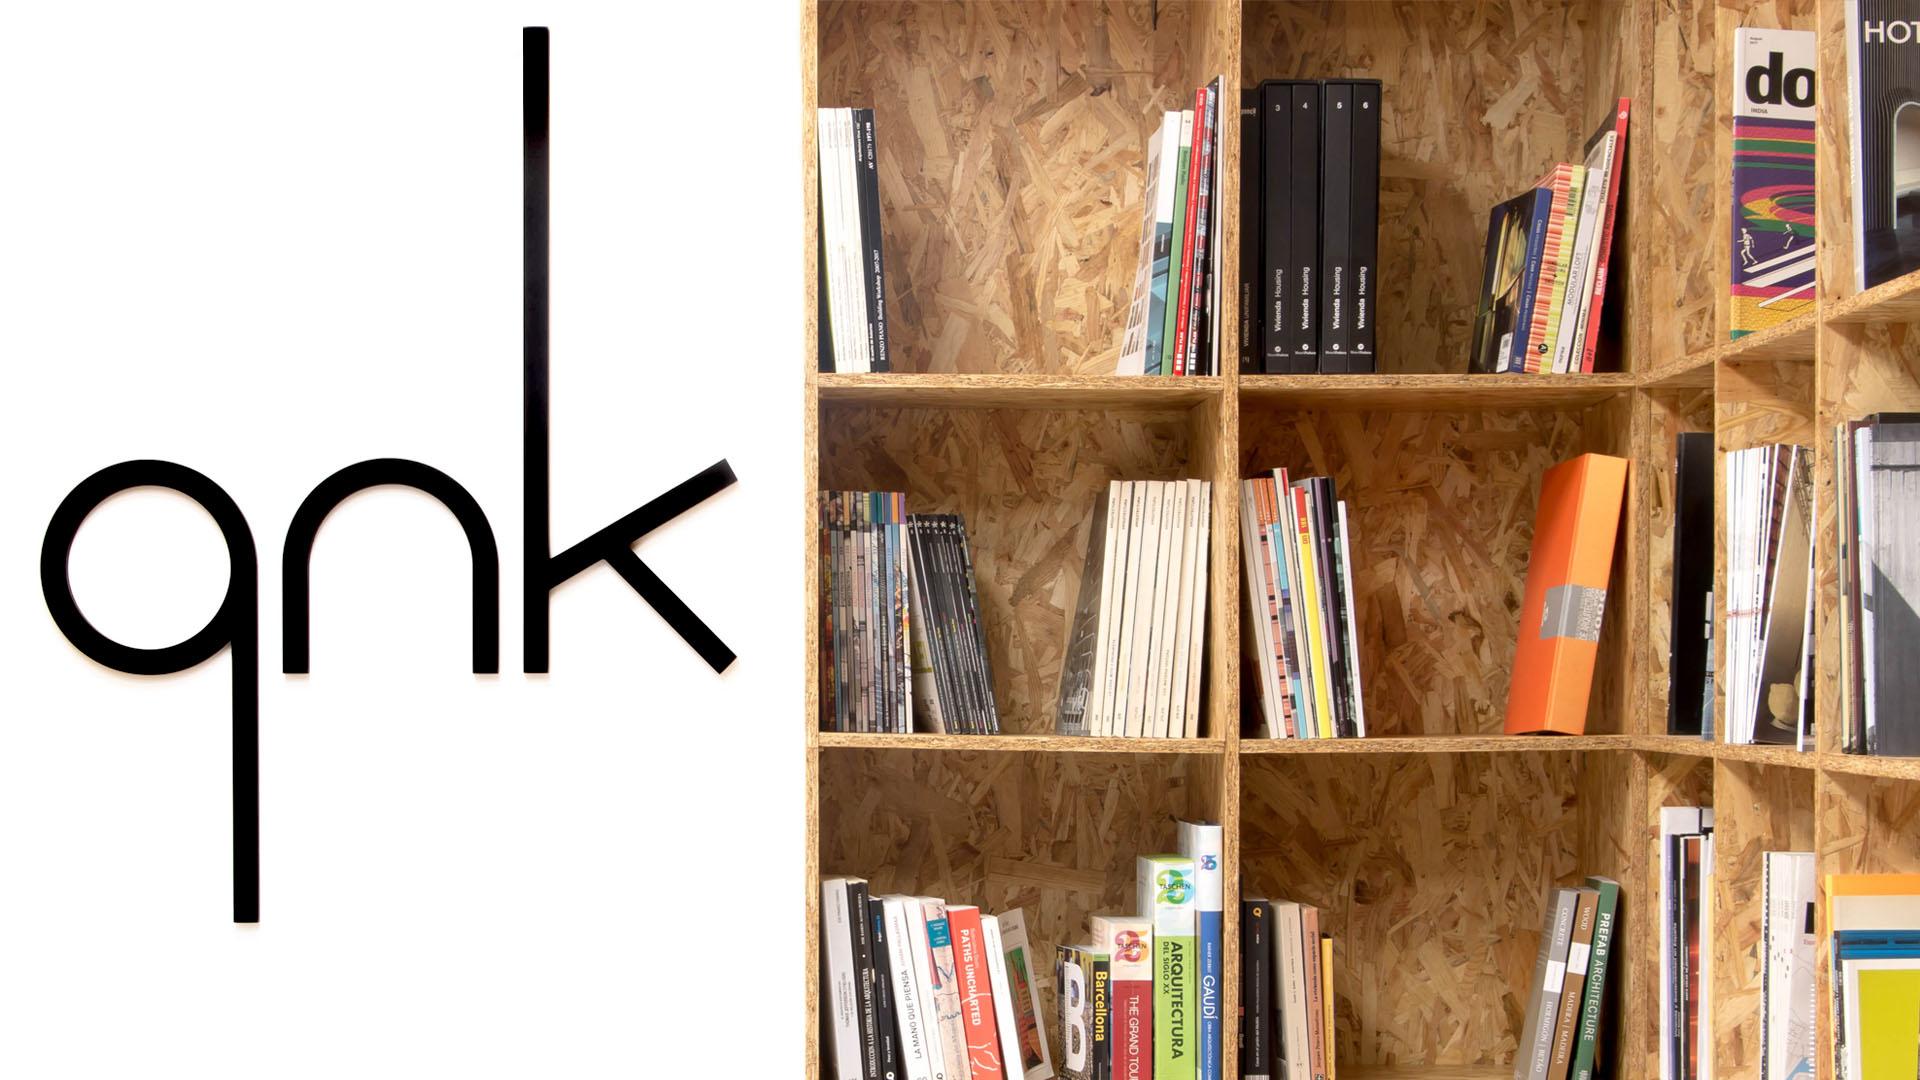 Slider estudio qnk. Detalle librería